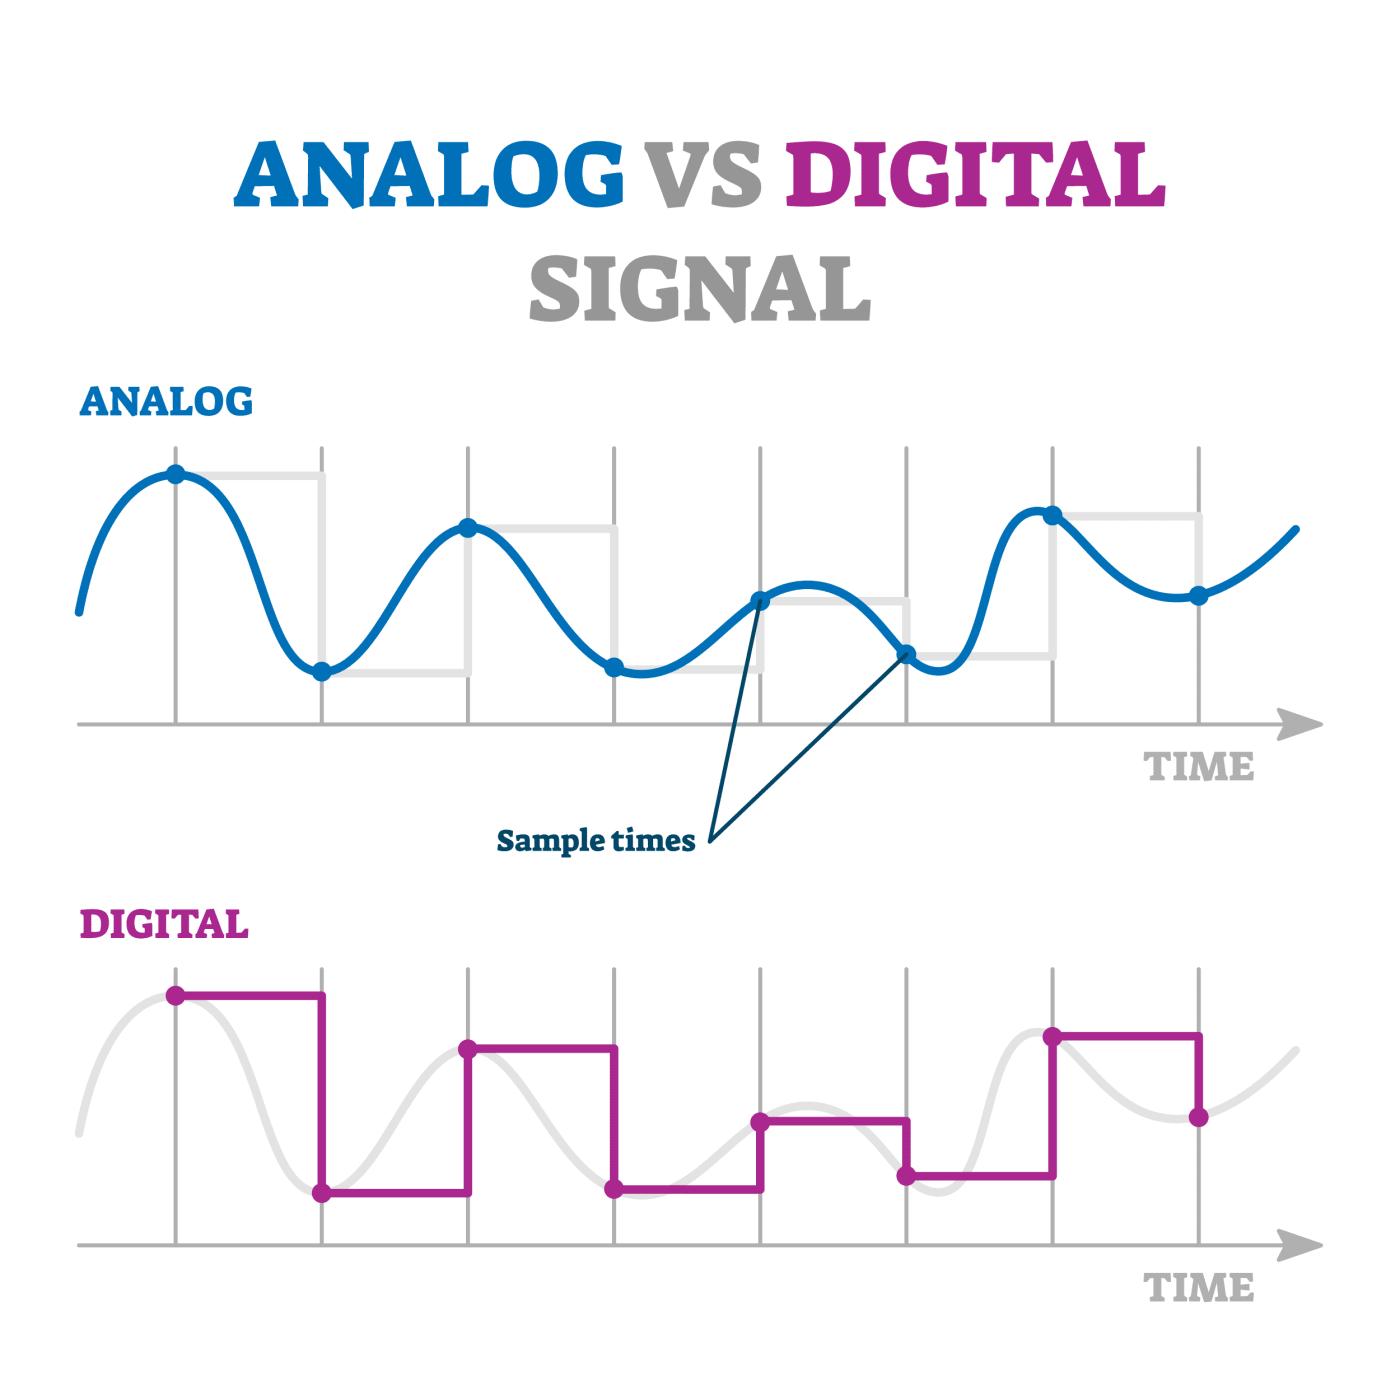 Analogue vs Digital signals